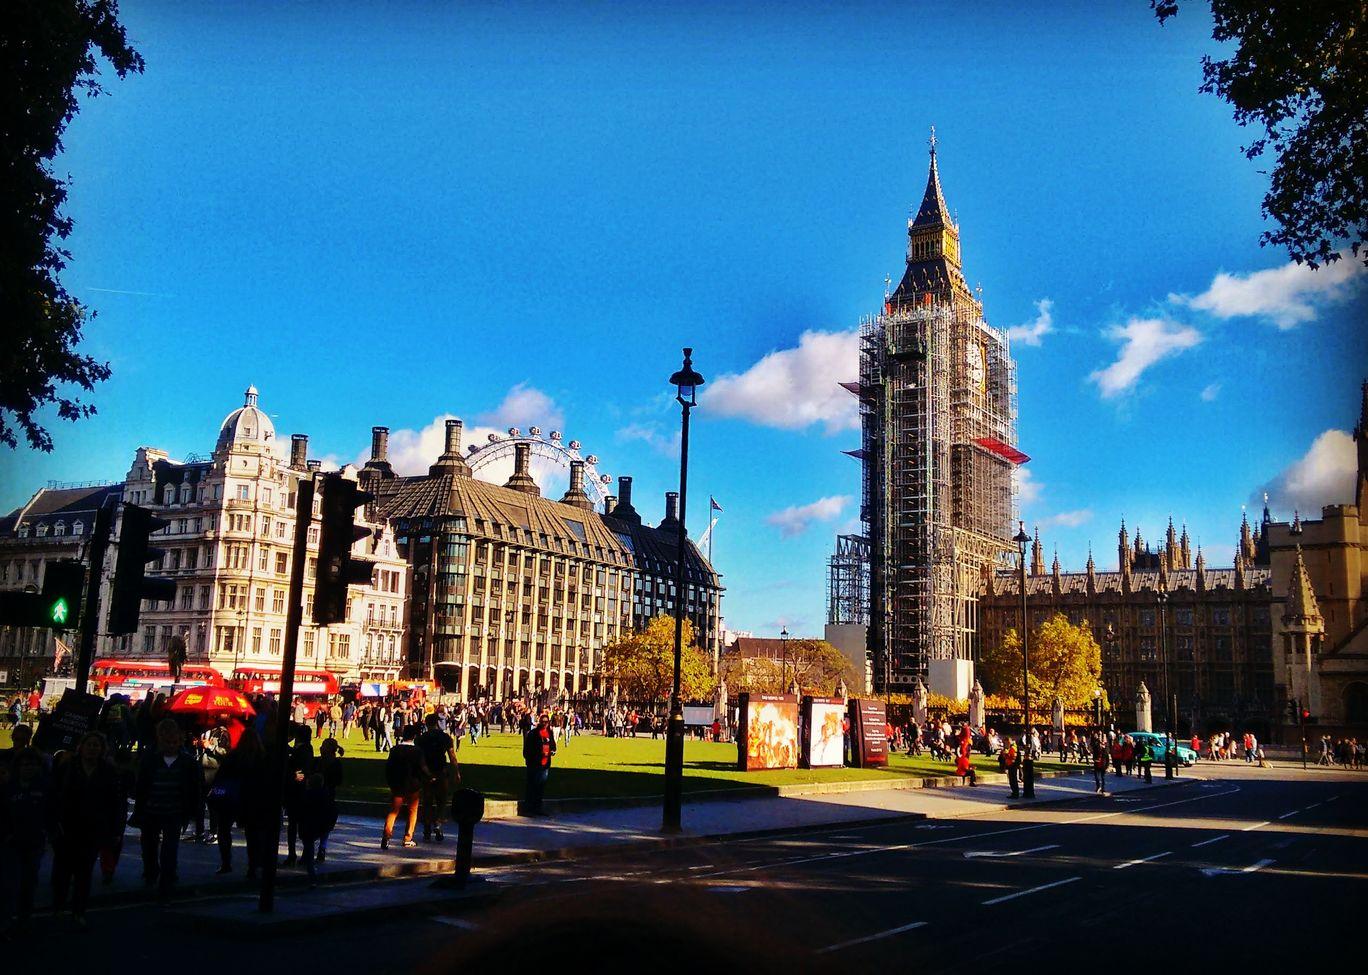 Photo of Big Ben By Pallavi Swaroop